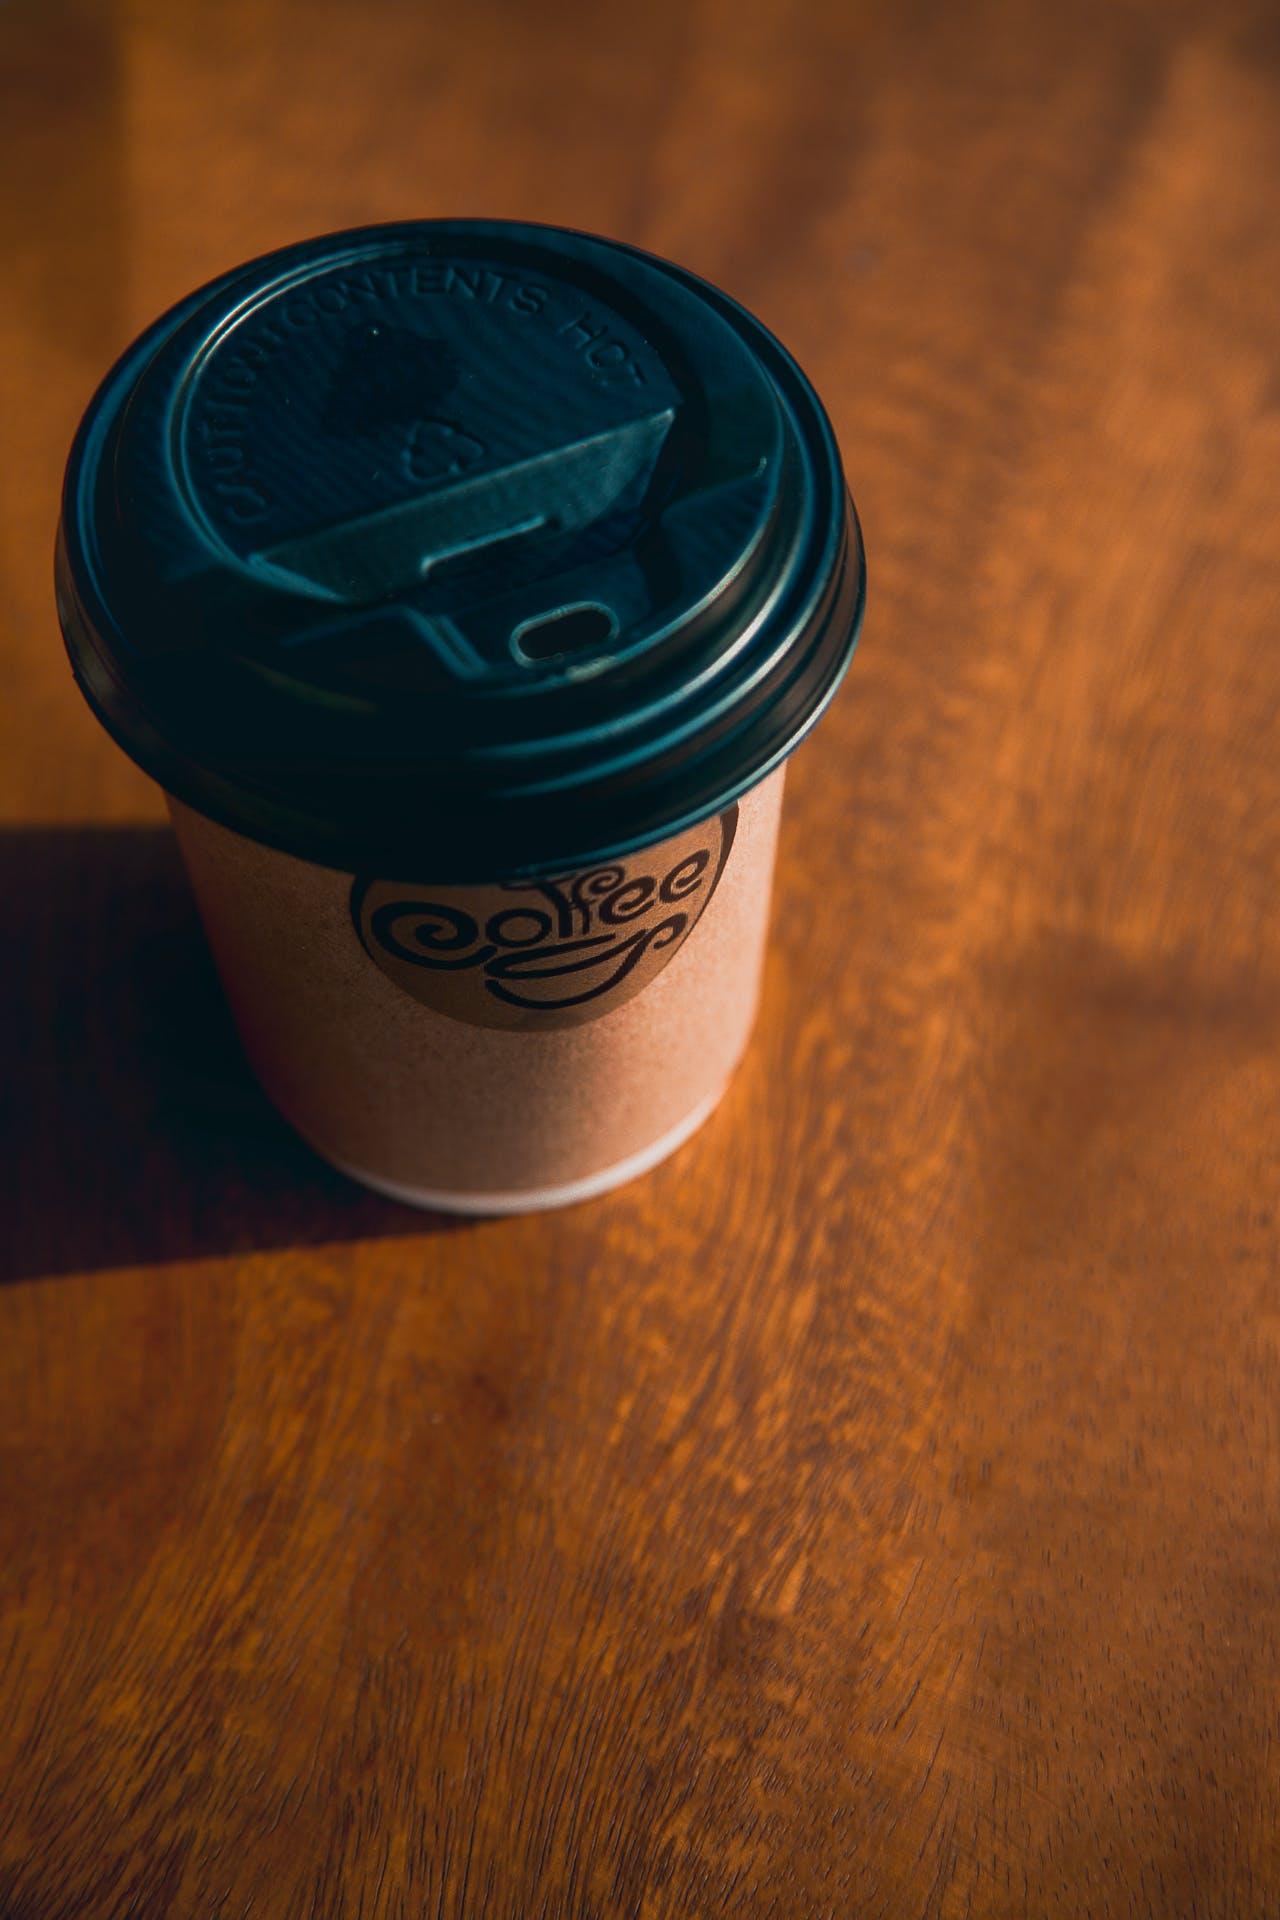 Gratis lagerfoto af cafe, cappuccino, flatwhite, fotografi